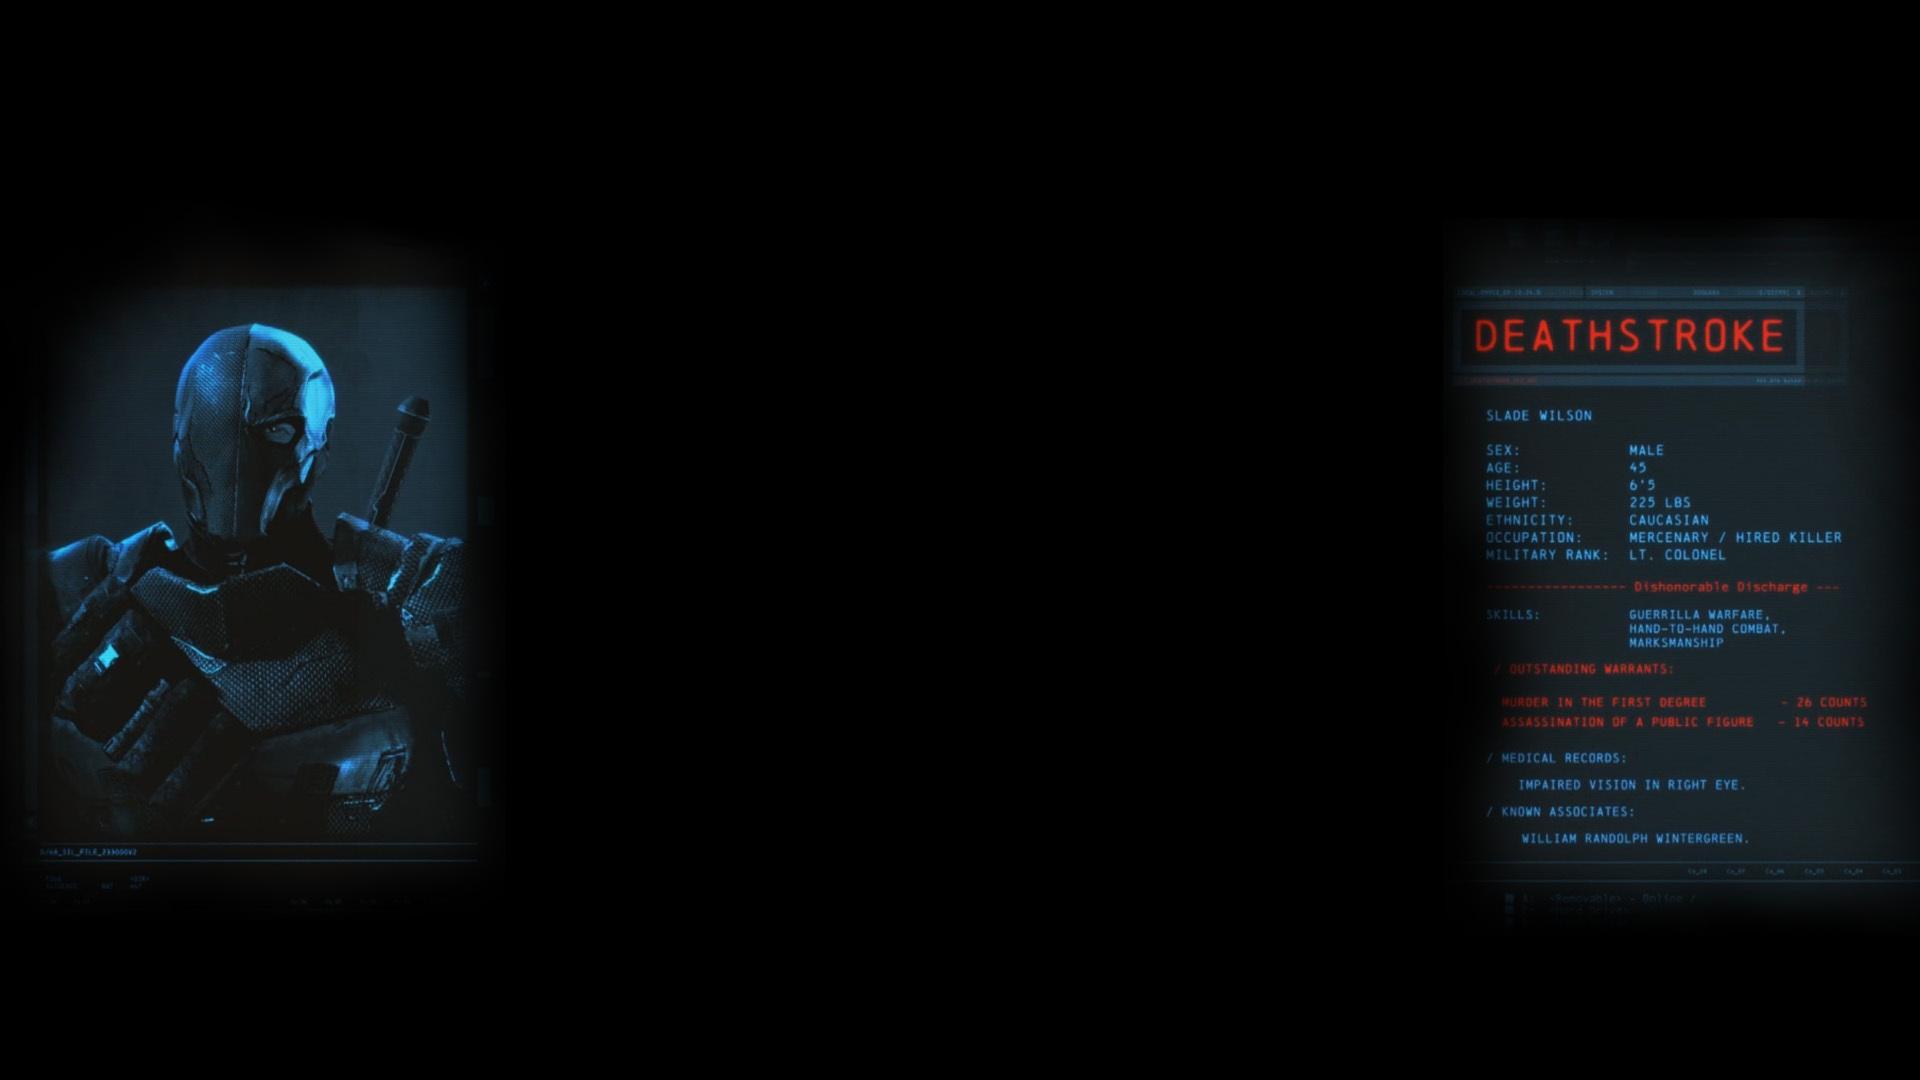 Deathstroke (Profile Background)